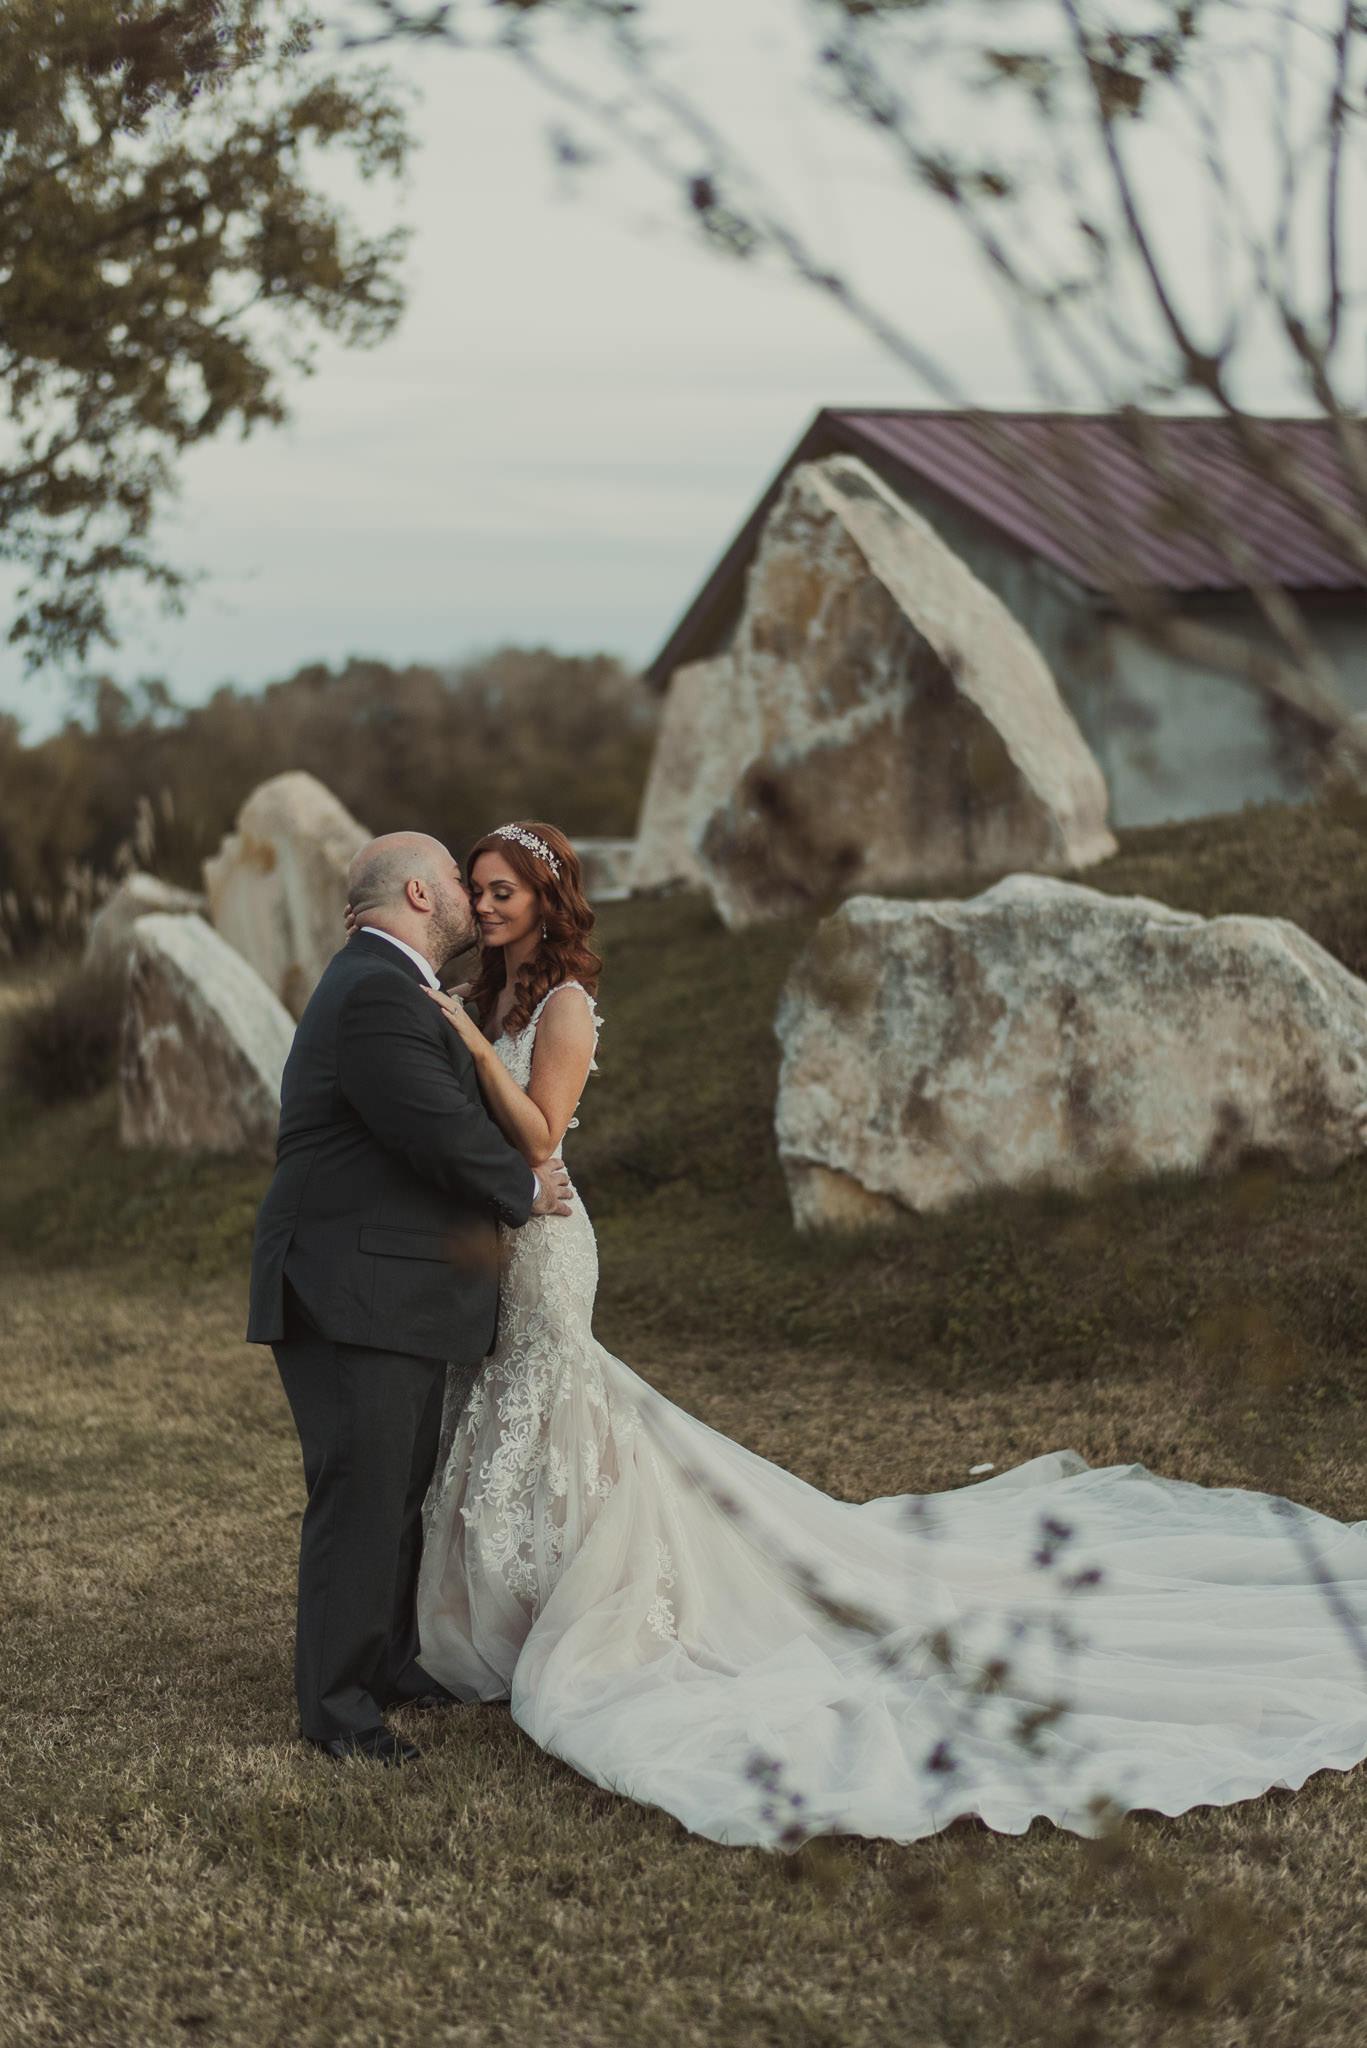 Olde-Dobbin-station-wedding-houston-montgomery-rustic-wedding-deer-antler-photographer